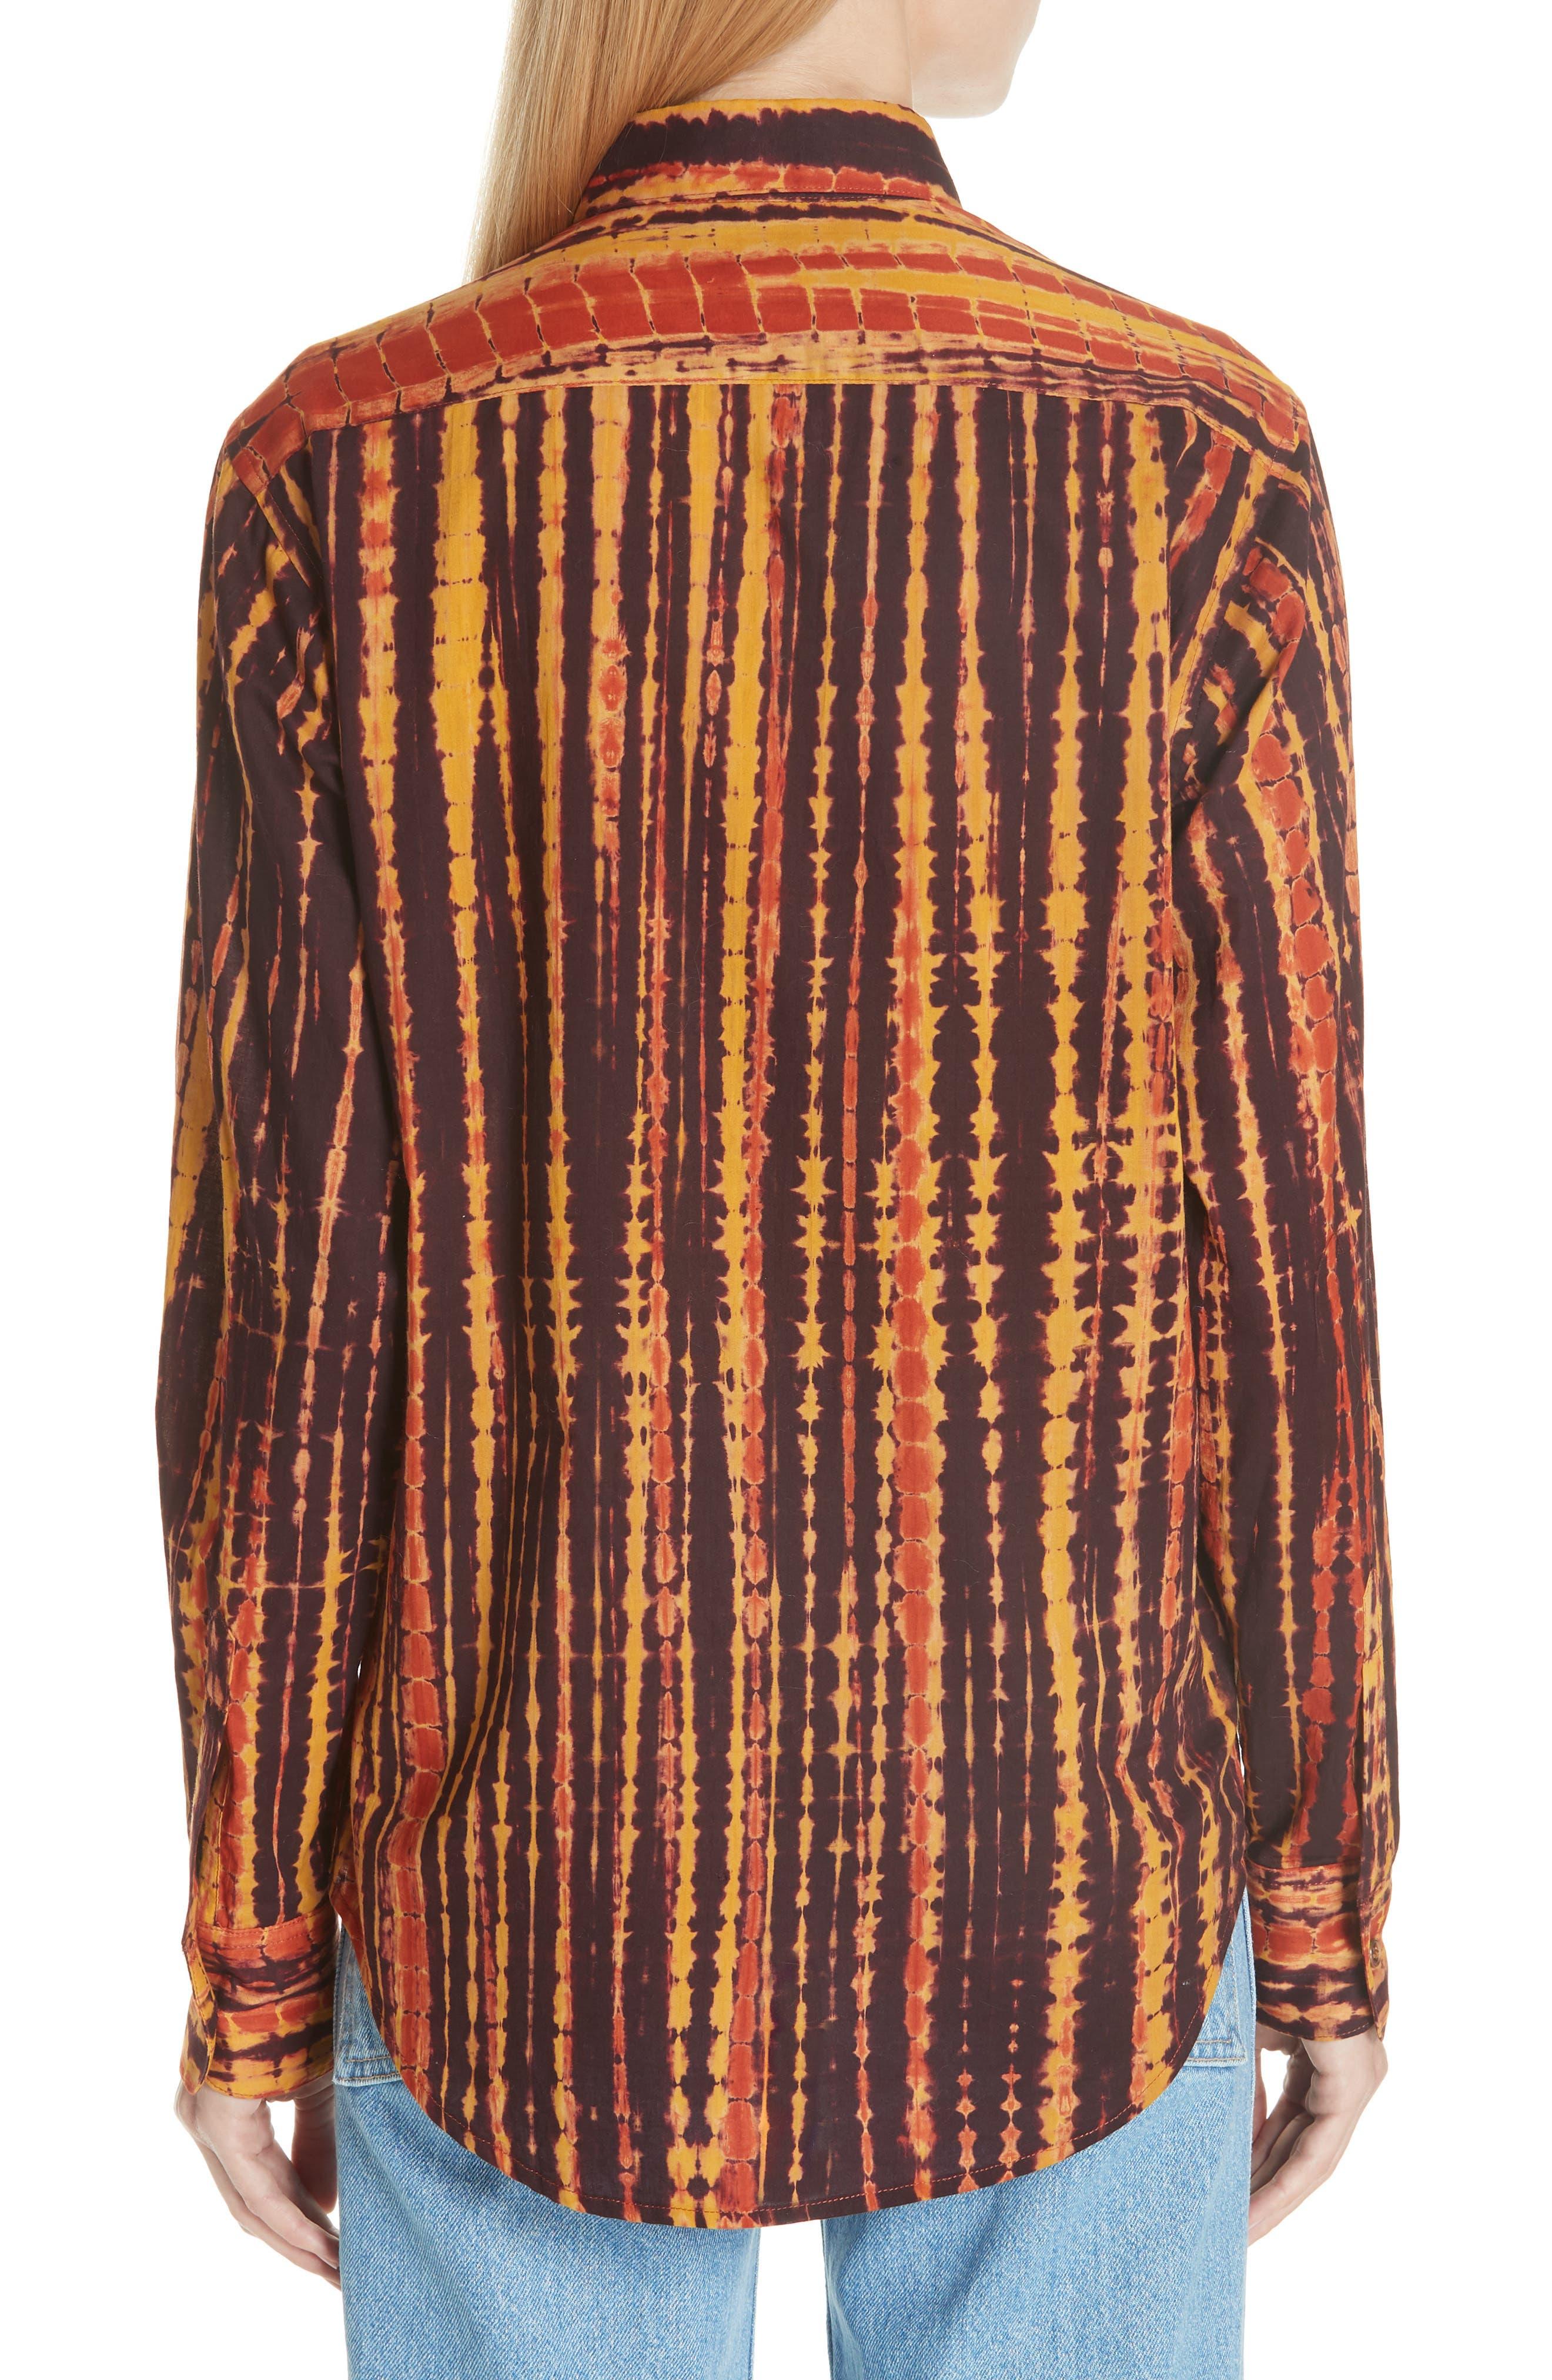 ECKHAUS LATTA,                             Hand Dyed Cotton Shirt,                             Alternate thumbnail 2, color,                             200